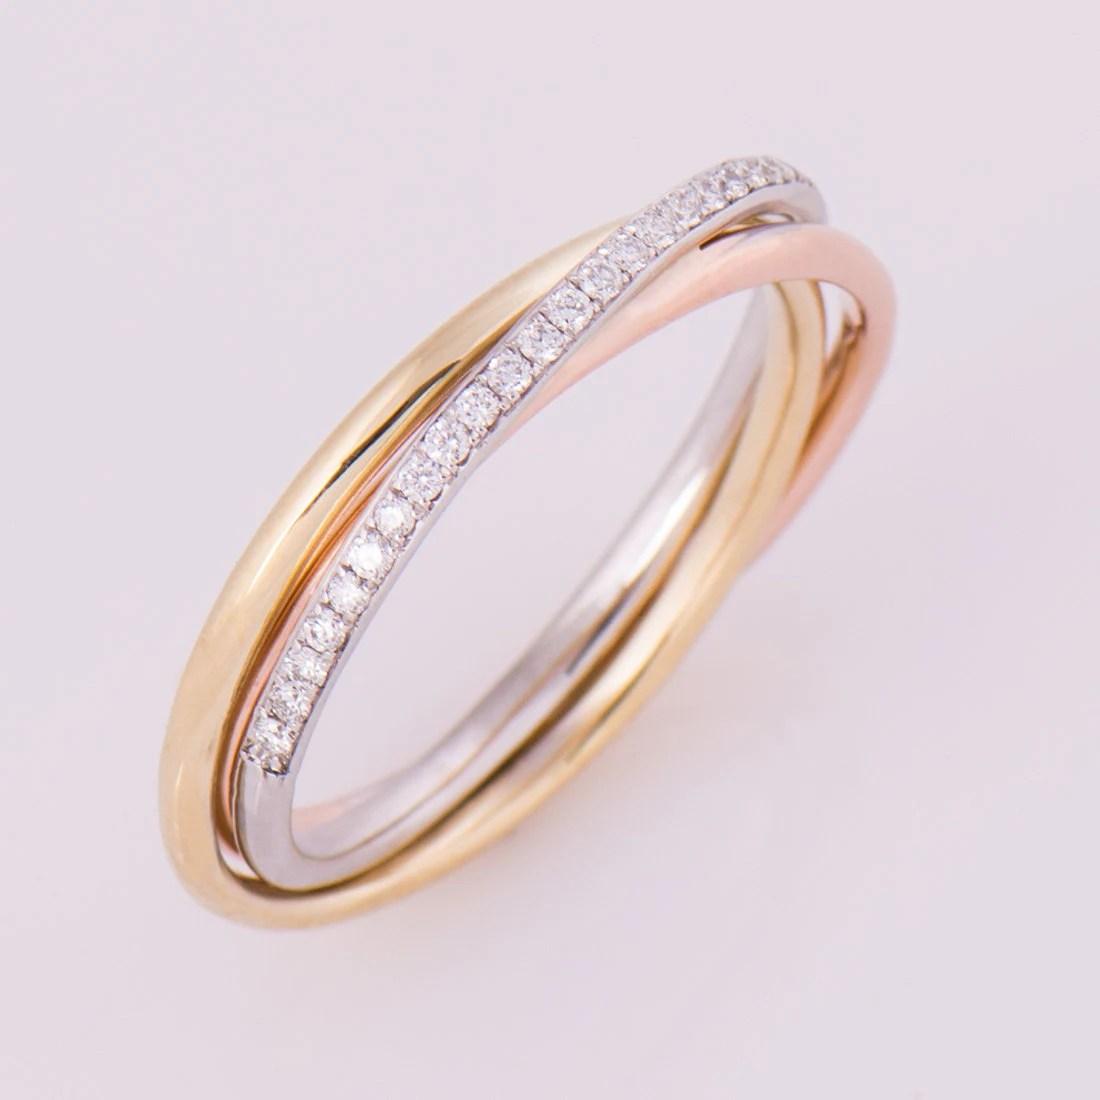 rolling ring multi band wedding ring Three Tone Ring 14K 18K Gold Diamonds Band Anniversary Ring Wedding Ring Diamond Band Trinity Tri Color Ring Stackable Ring